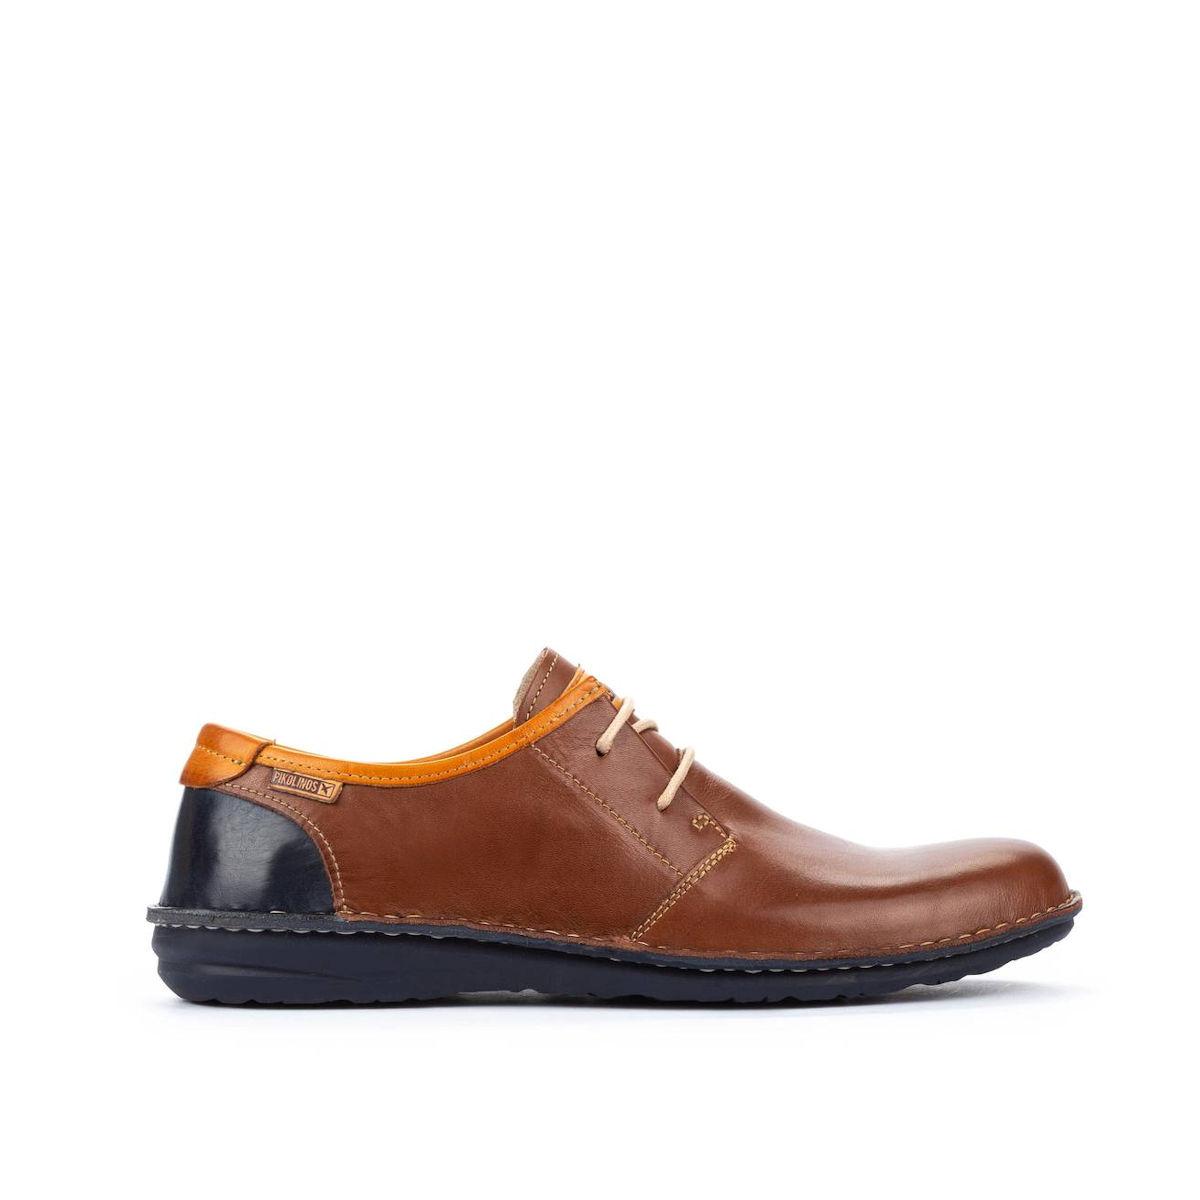 Pikolinos M8M-4298 - Mens Cuero Blucher Shoe